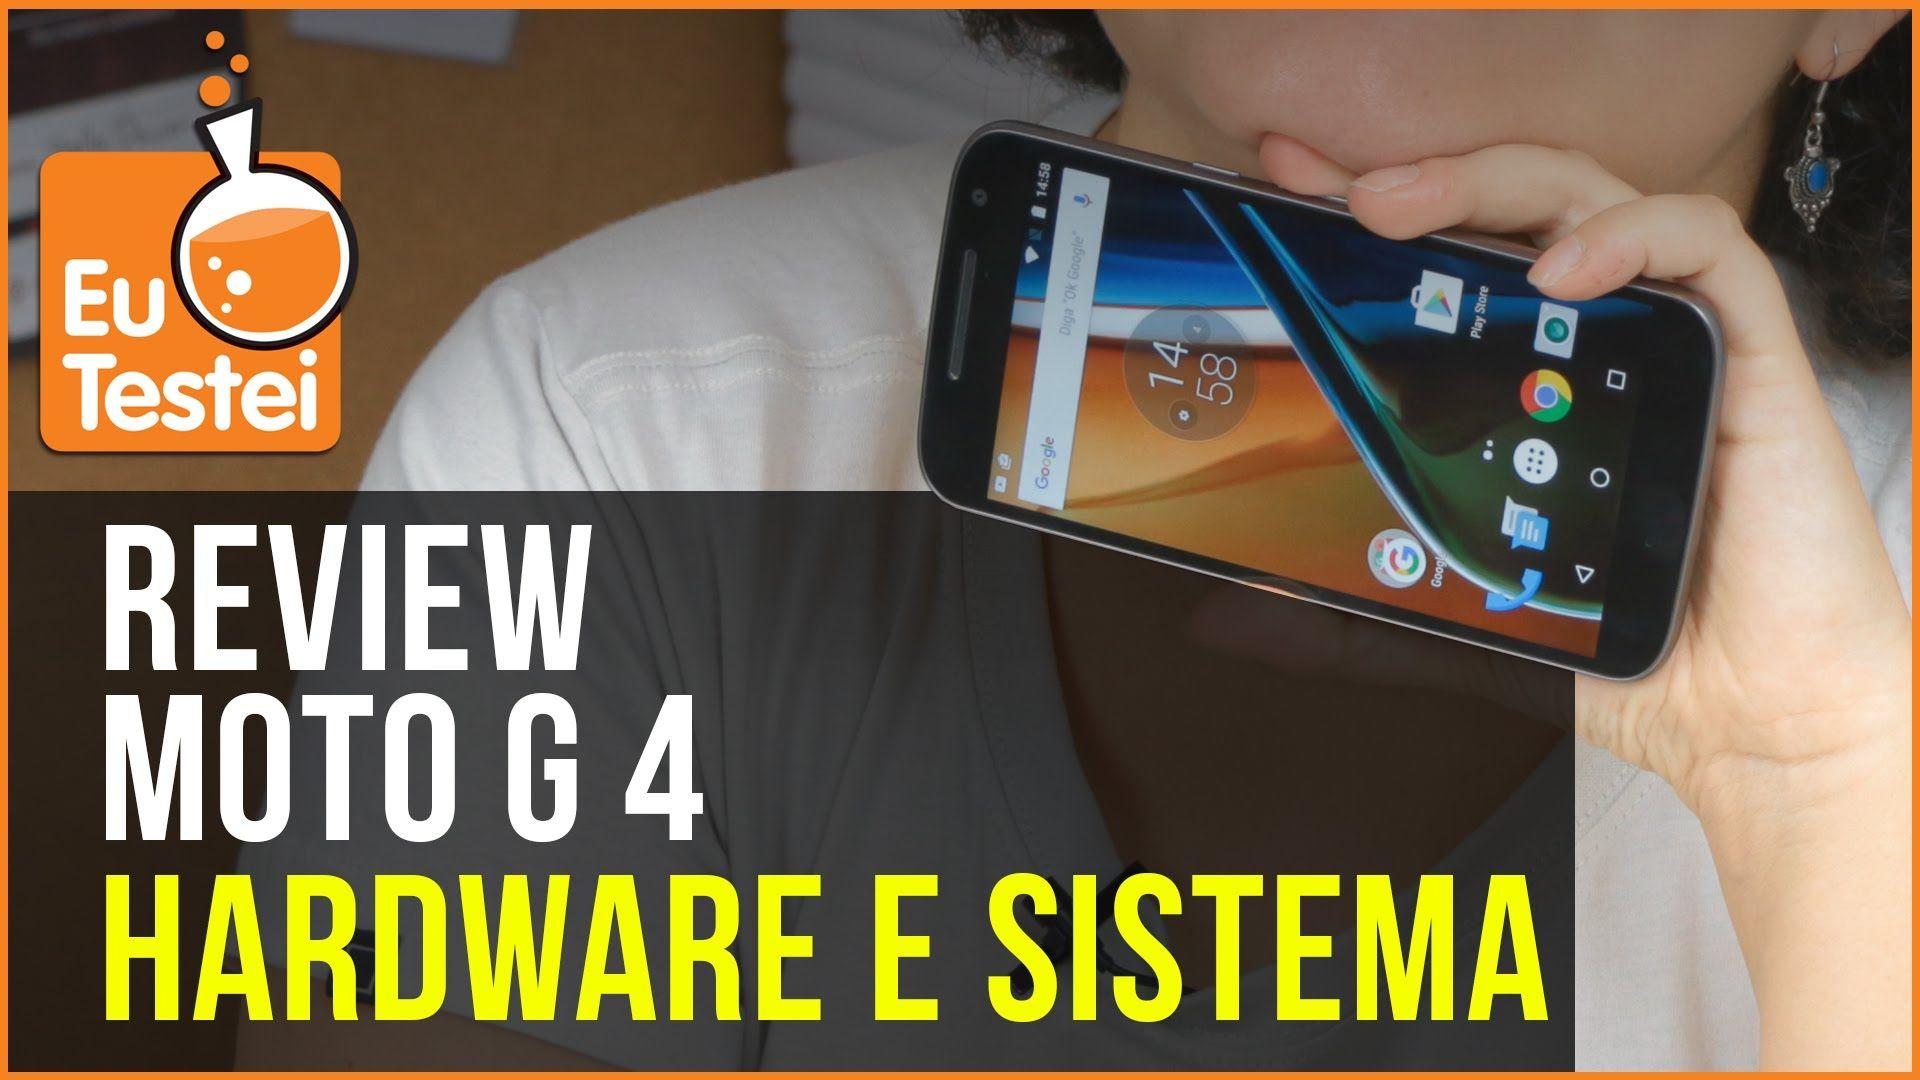 Moto G 4 tem hardware bom e sistema quase puro, olha só!  - Resenha EuTe...